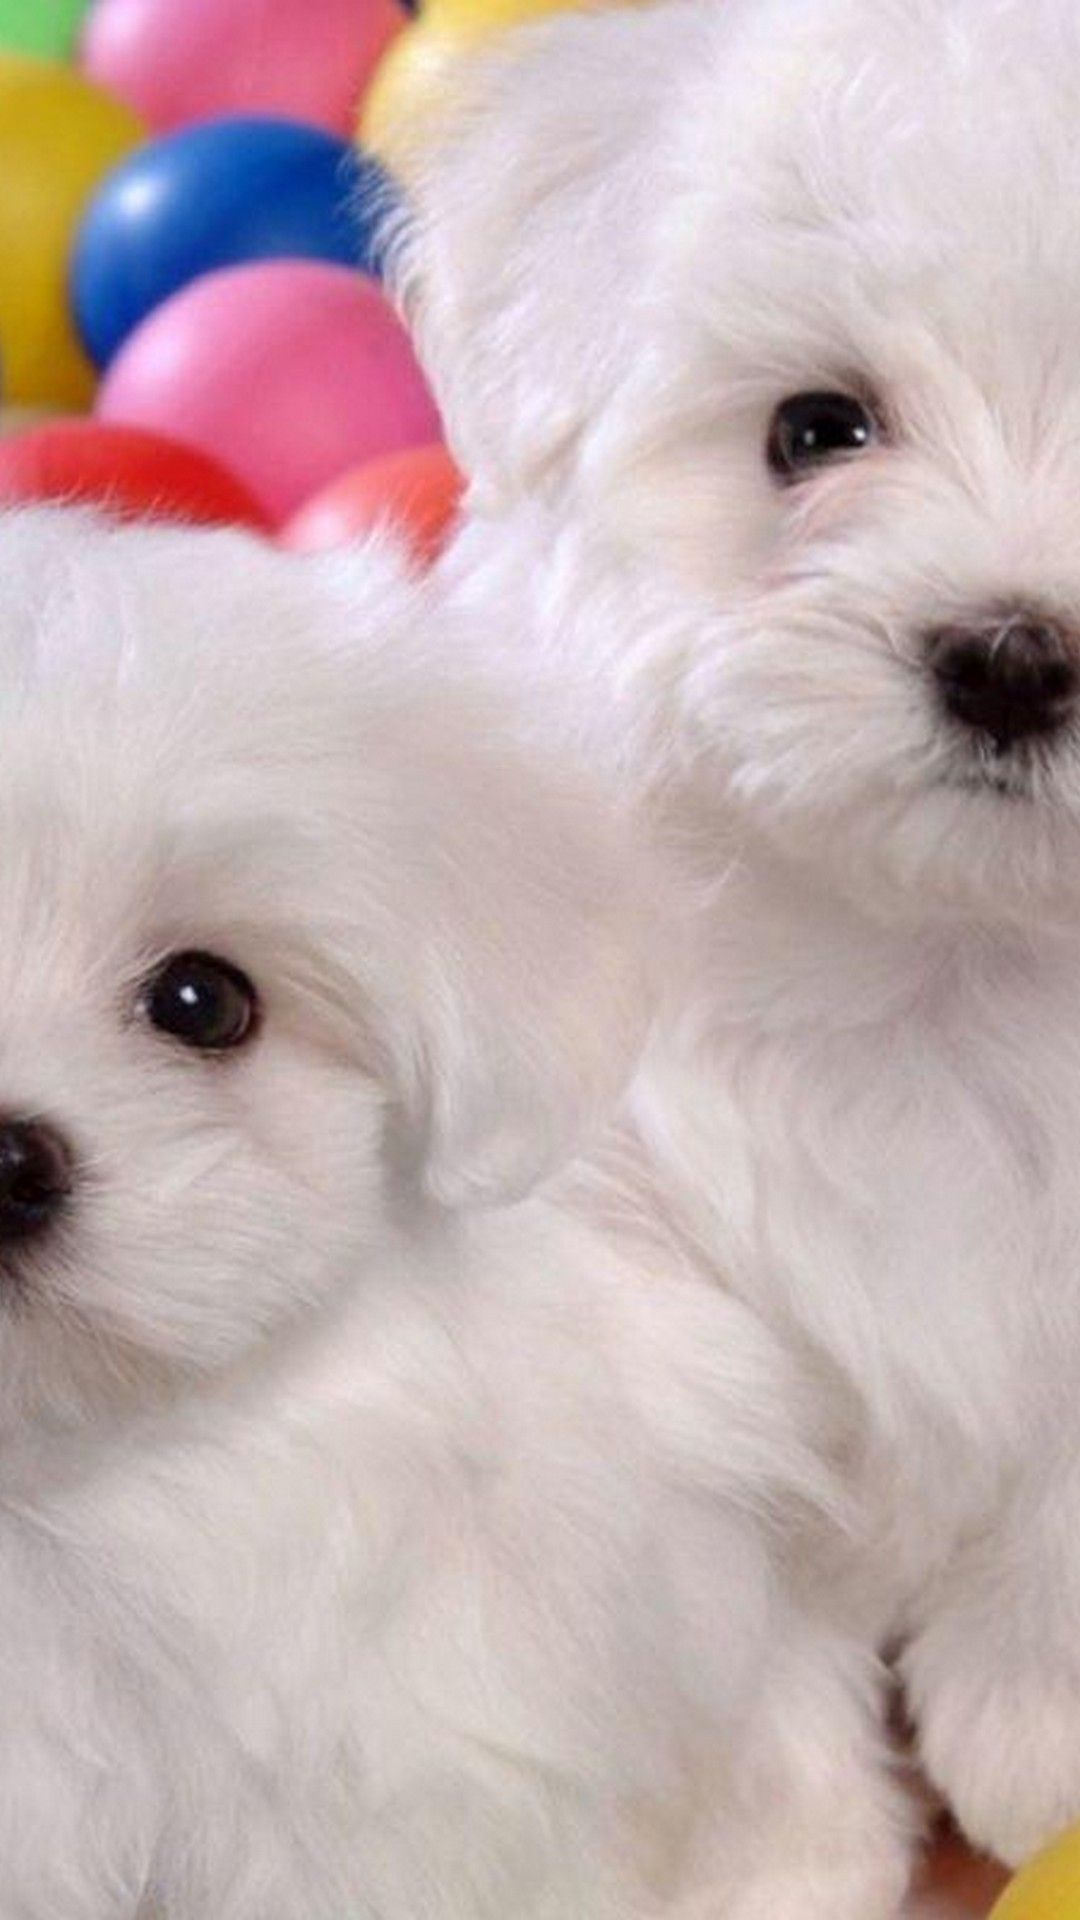 Puppies iPhone Wallpaper HD